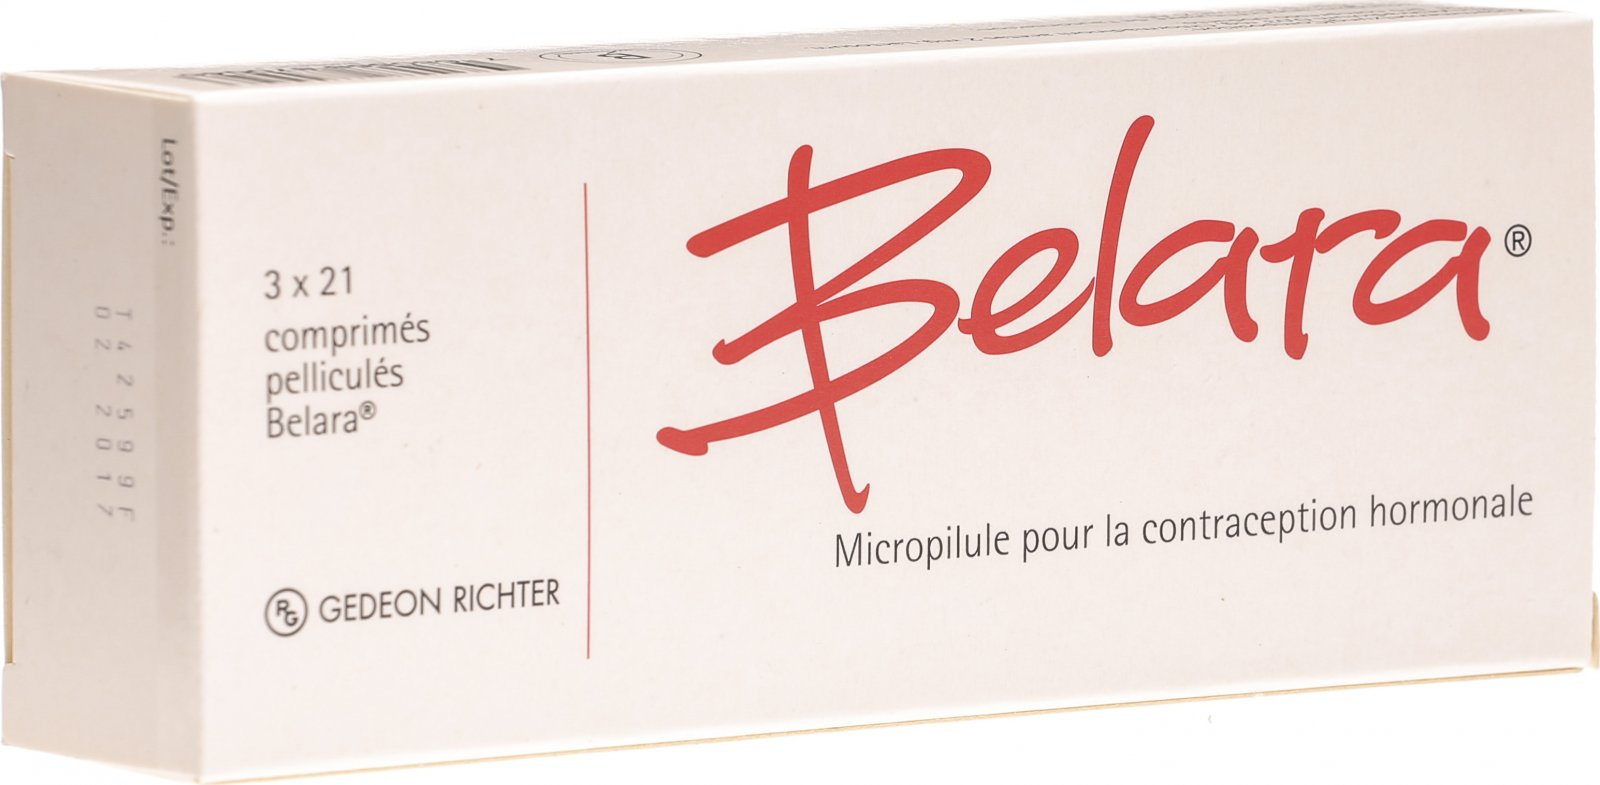 Nebenwirkungen belara absetzen Belara, Nebenwirkung